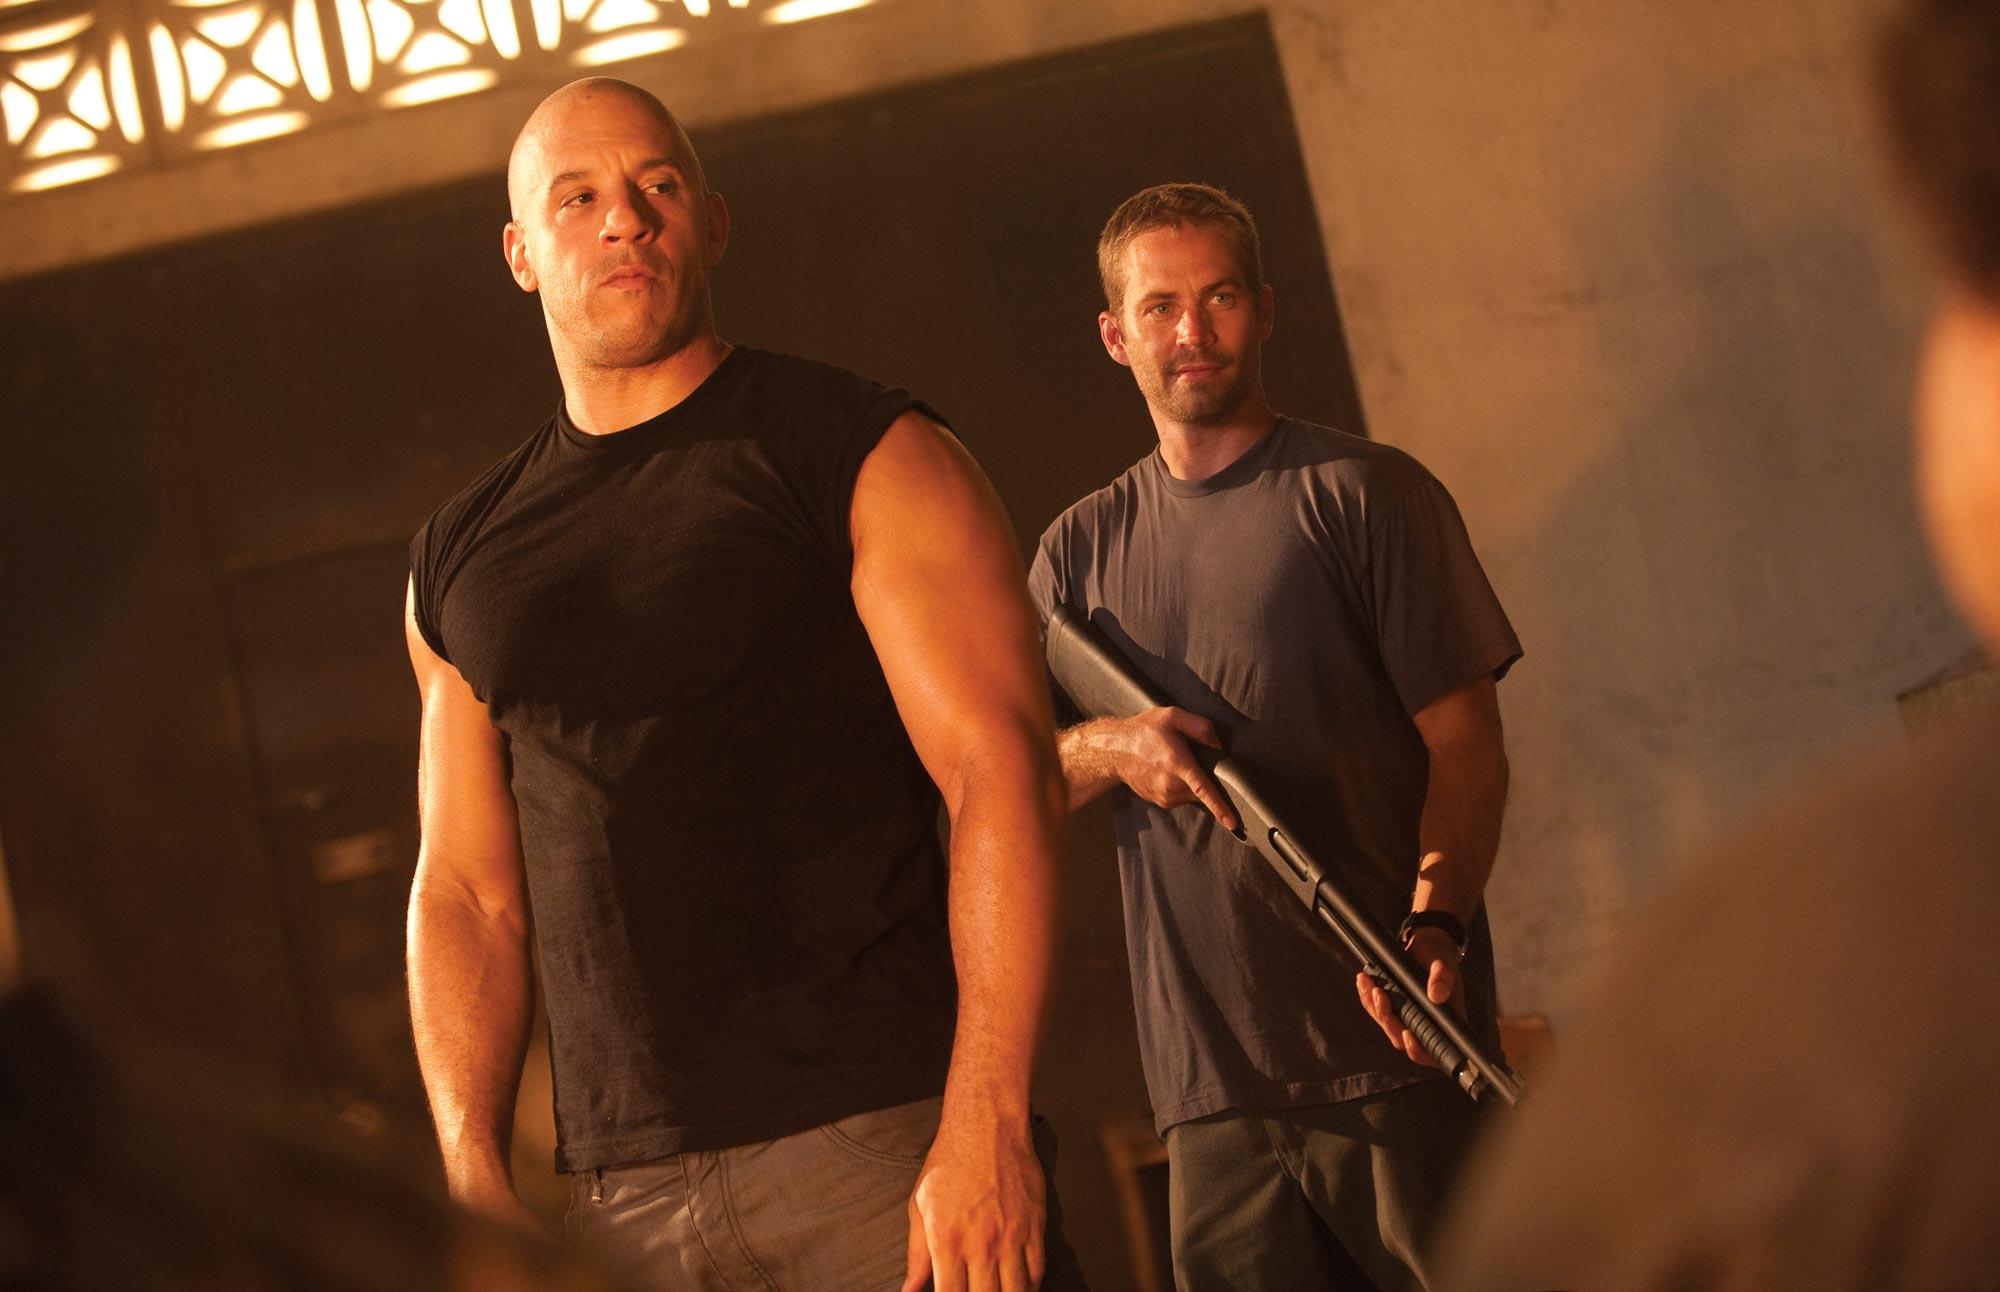 Fast and Furious 5, Vin Diesel and Paul Walker